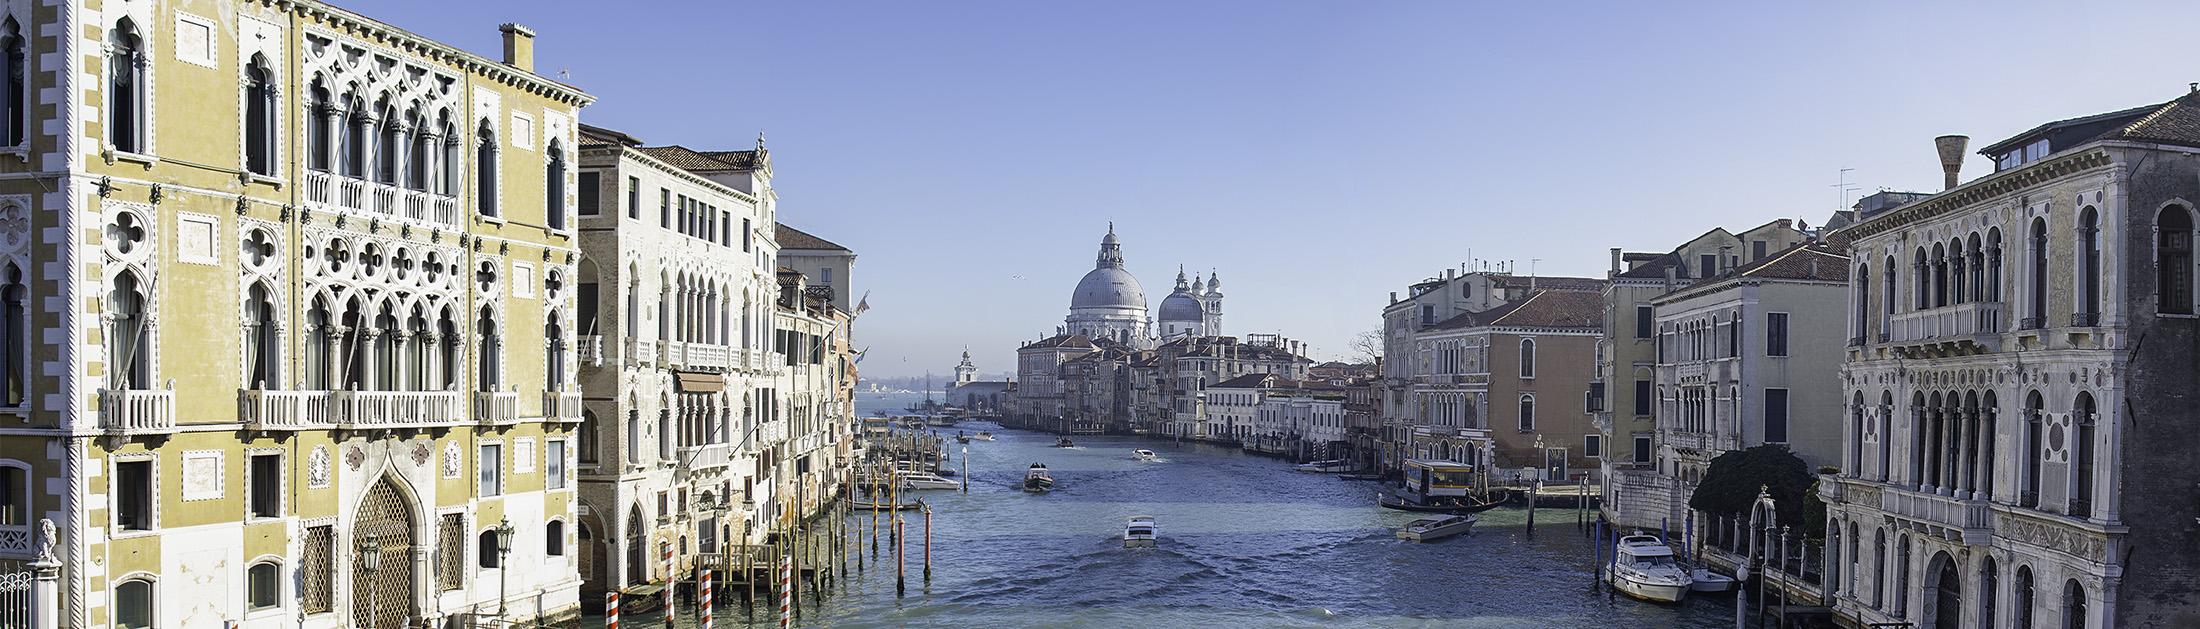 Venise panorama